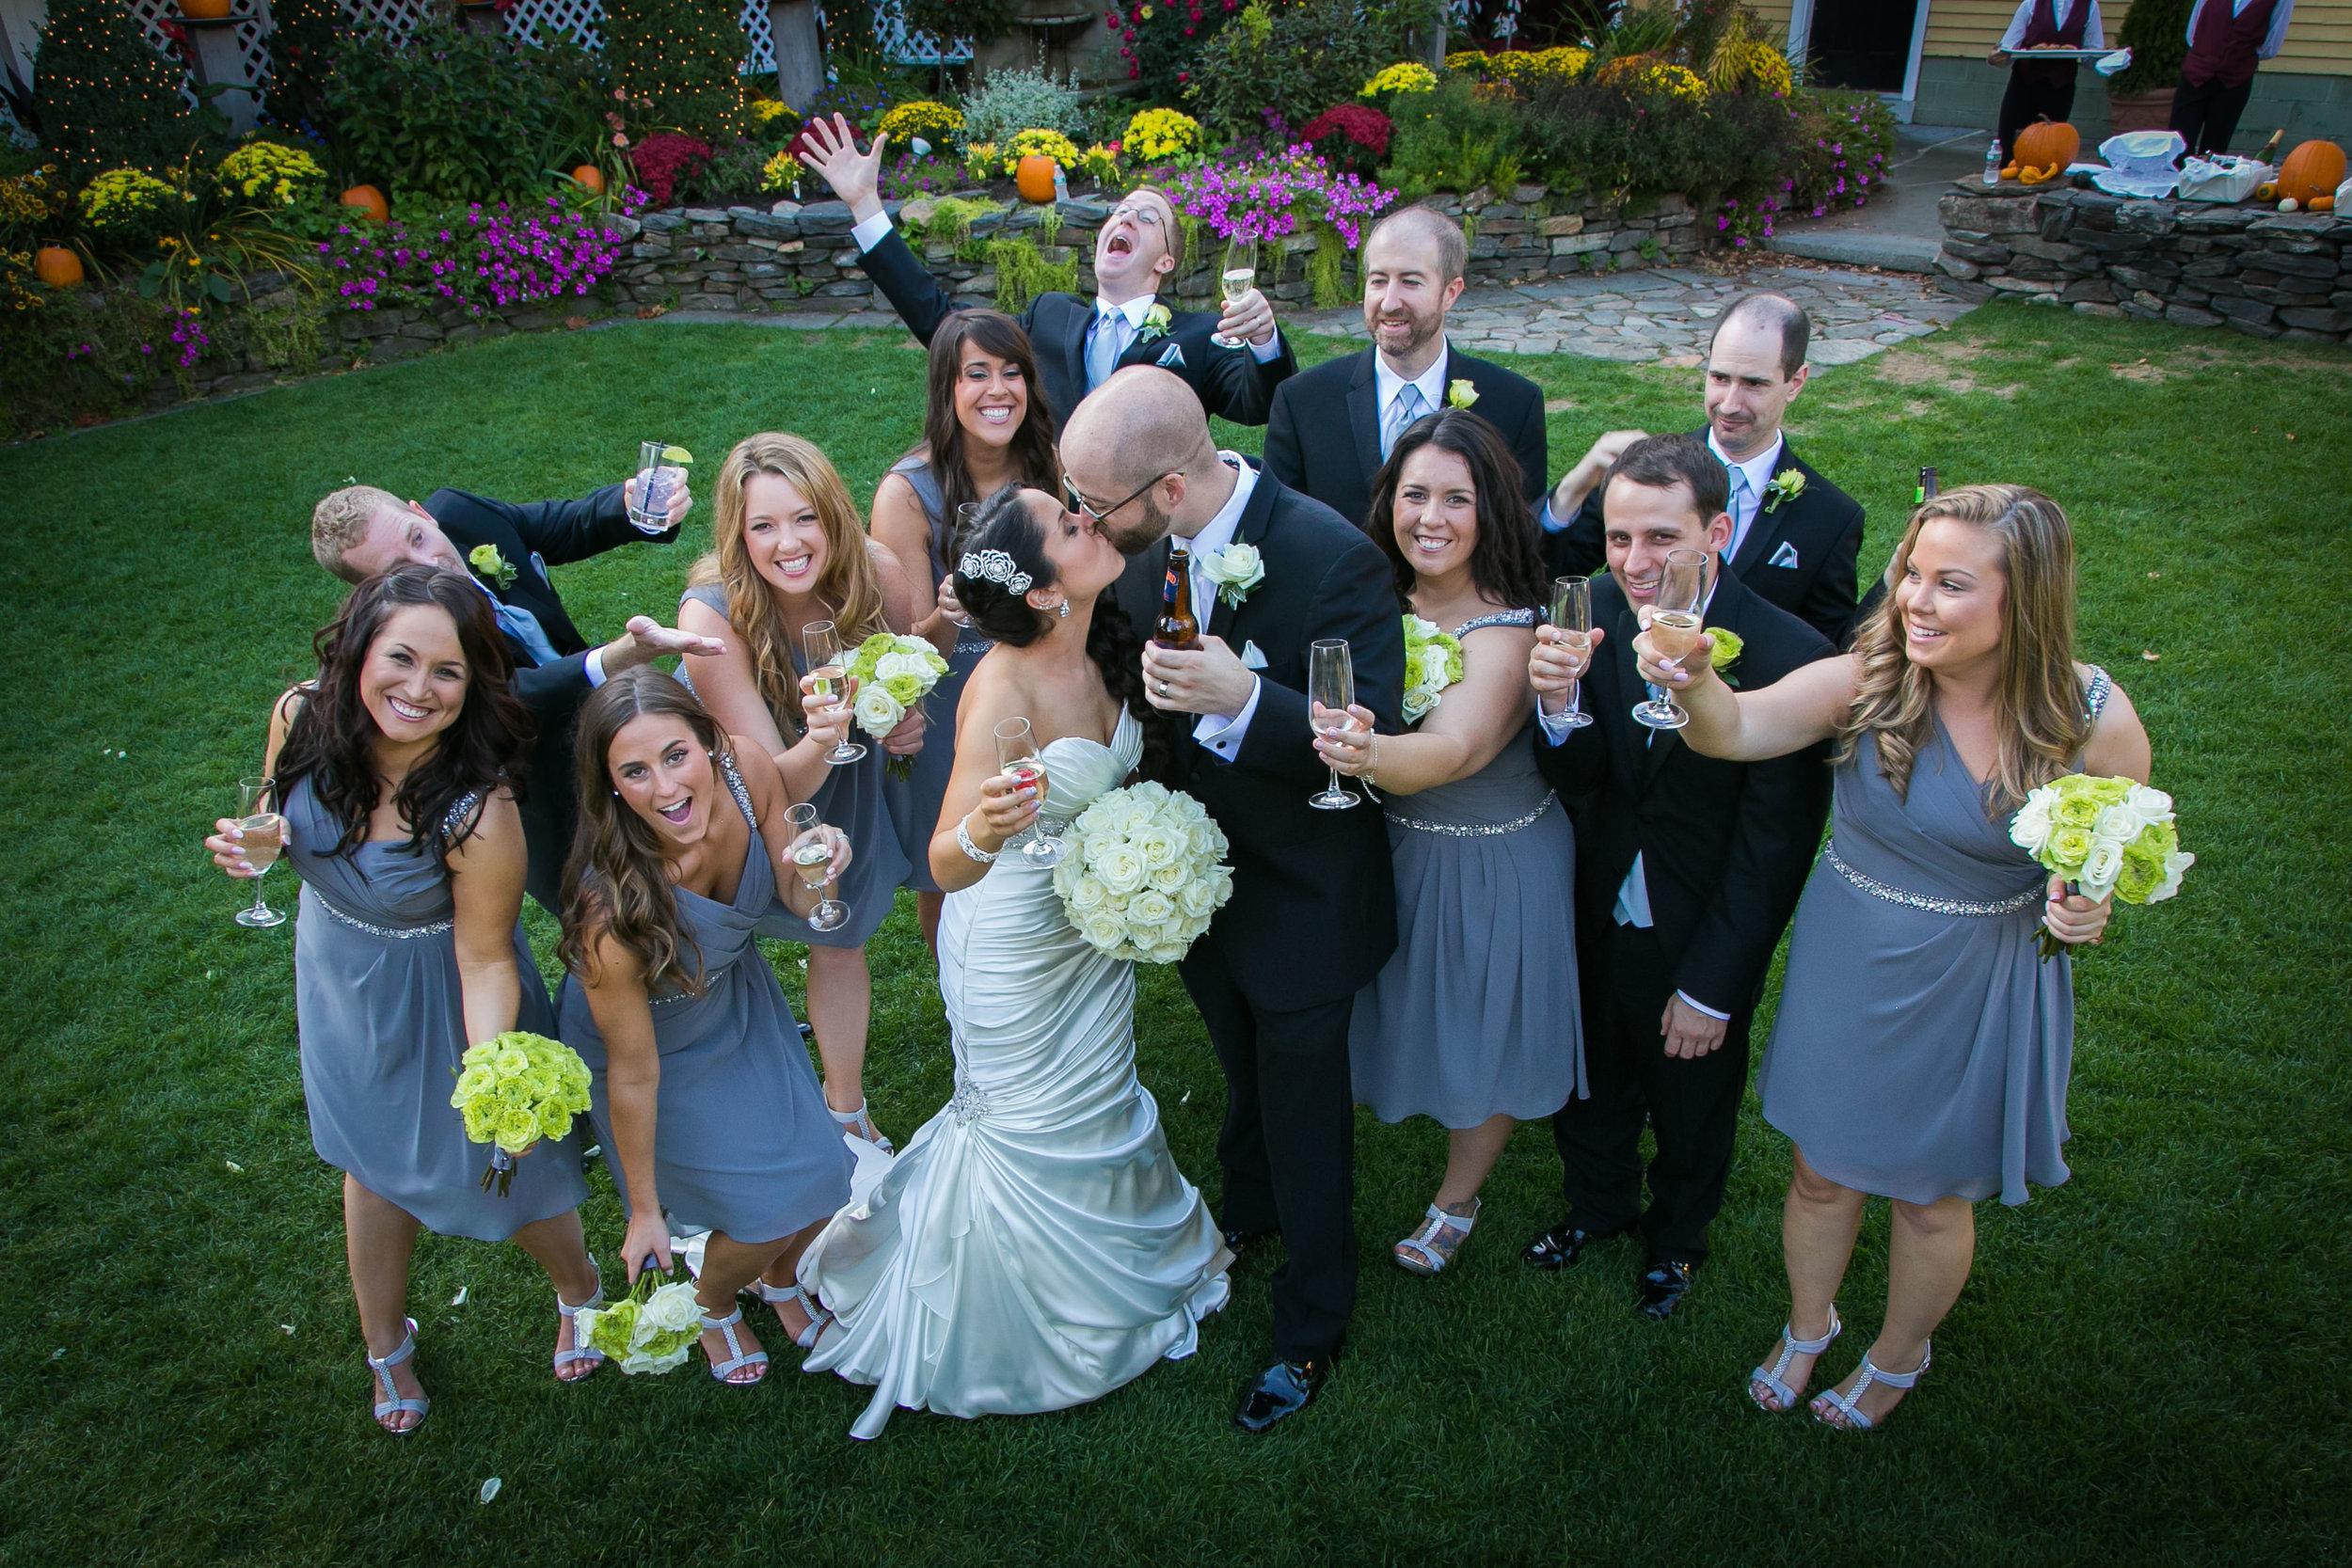 bedford-nh-wedding-photography-406.jpg